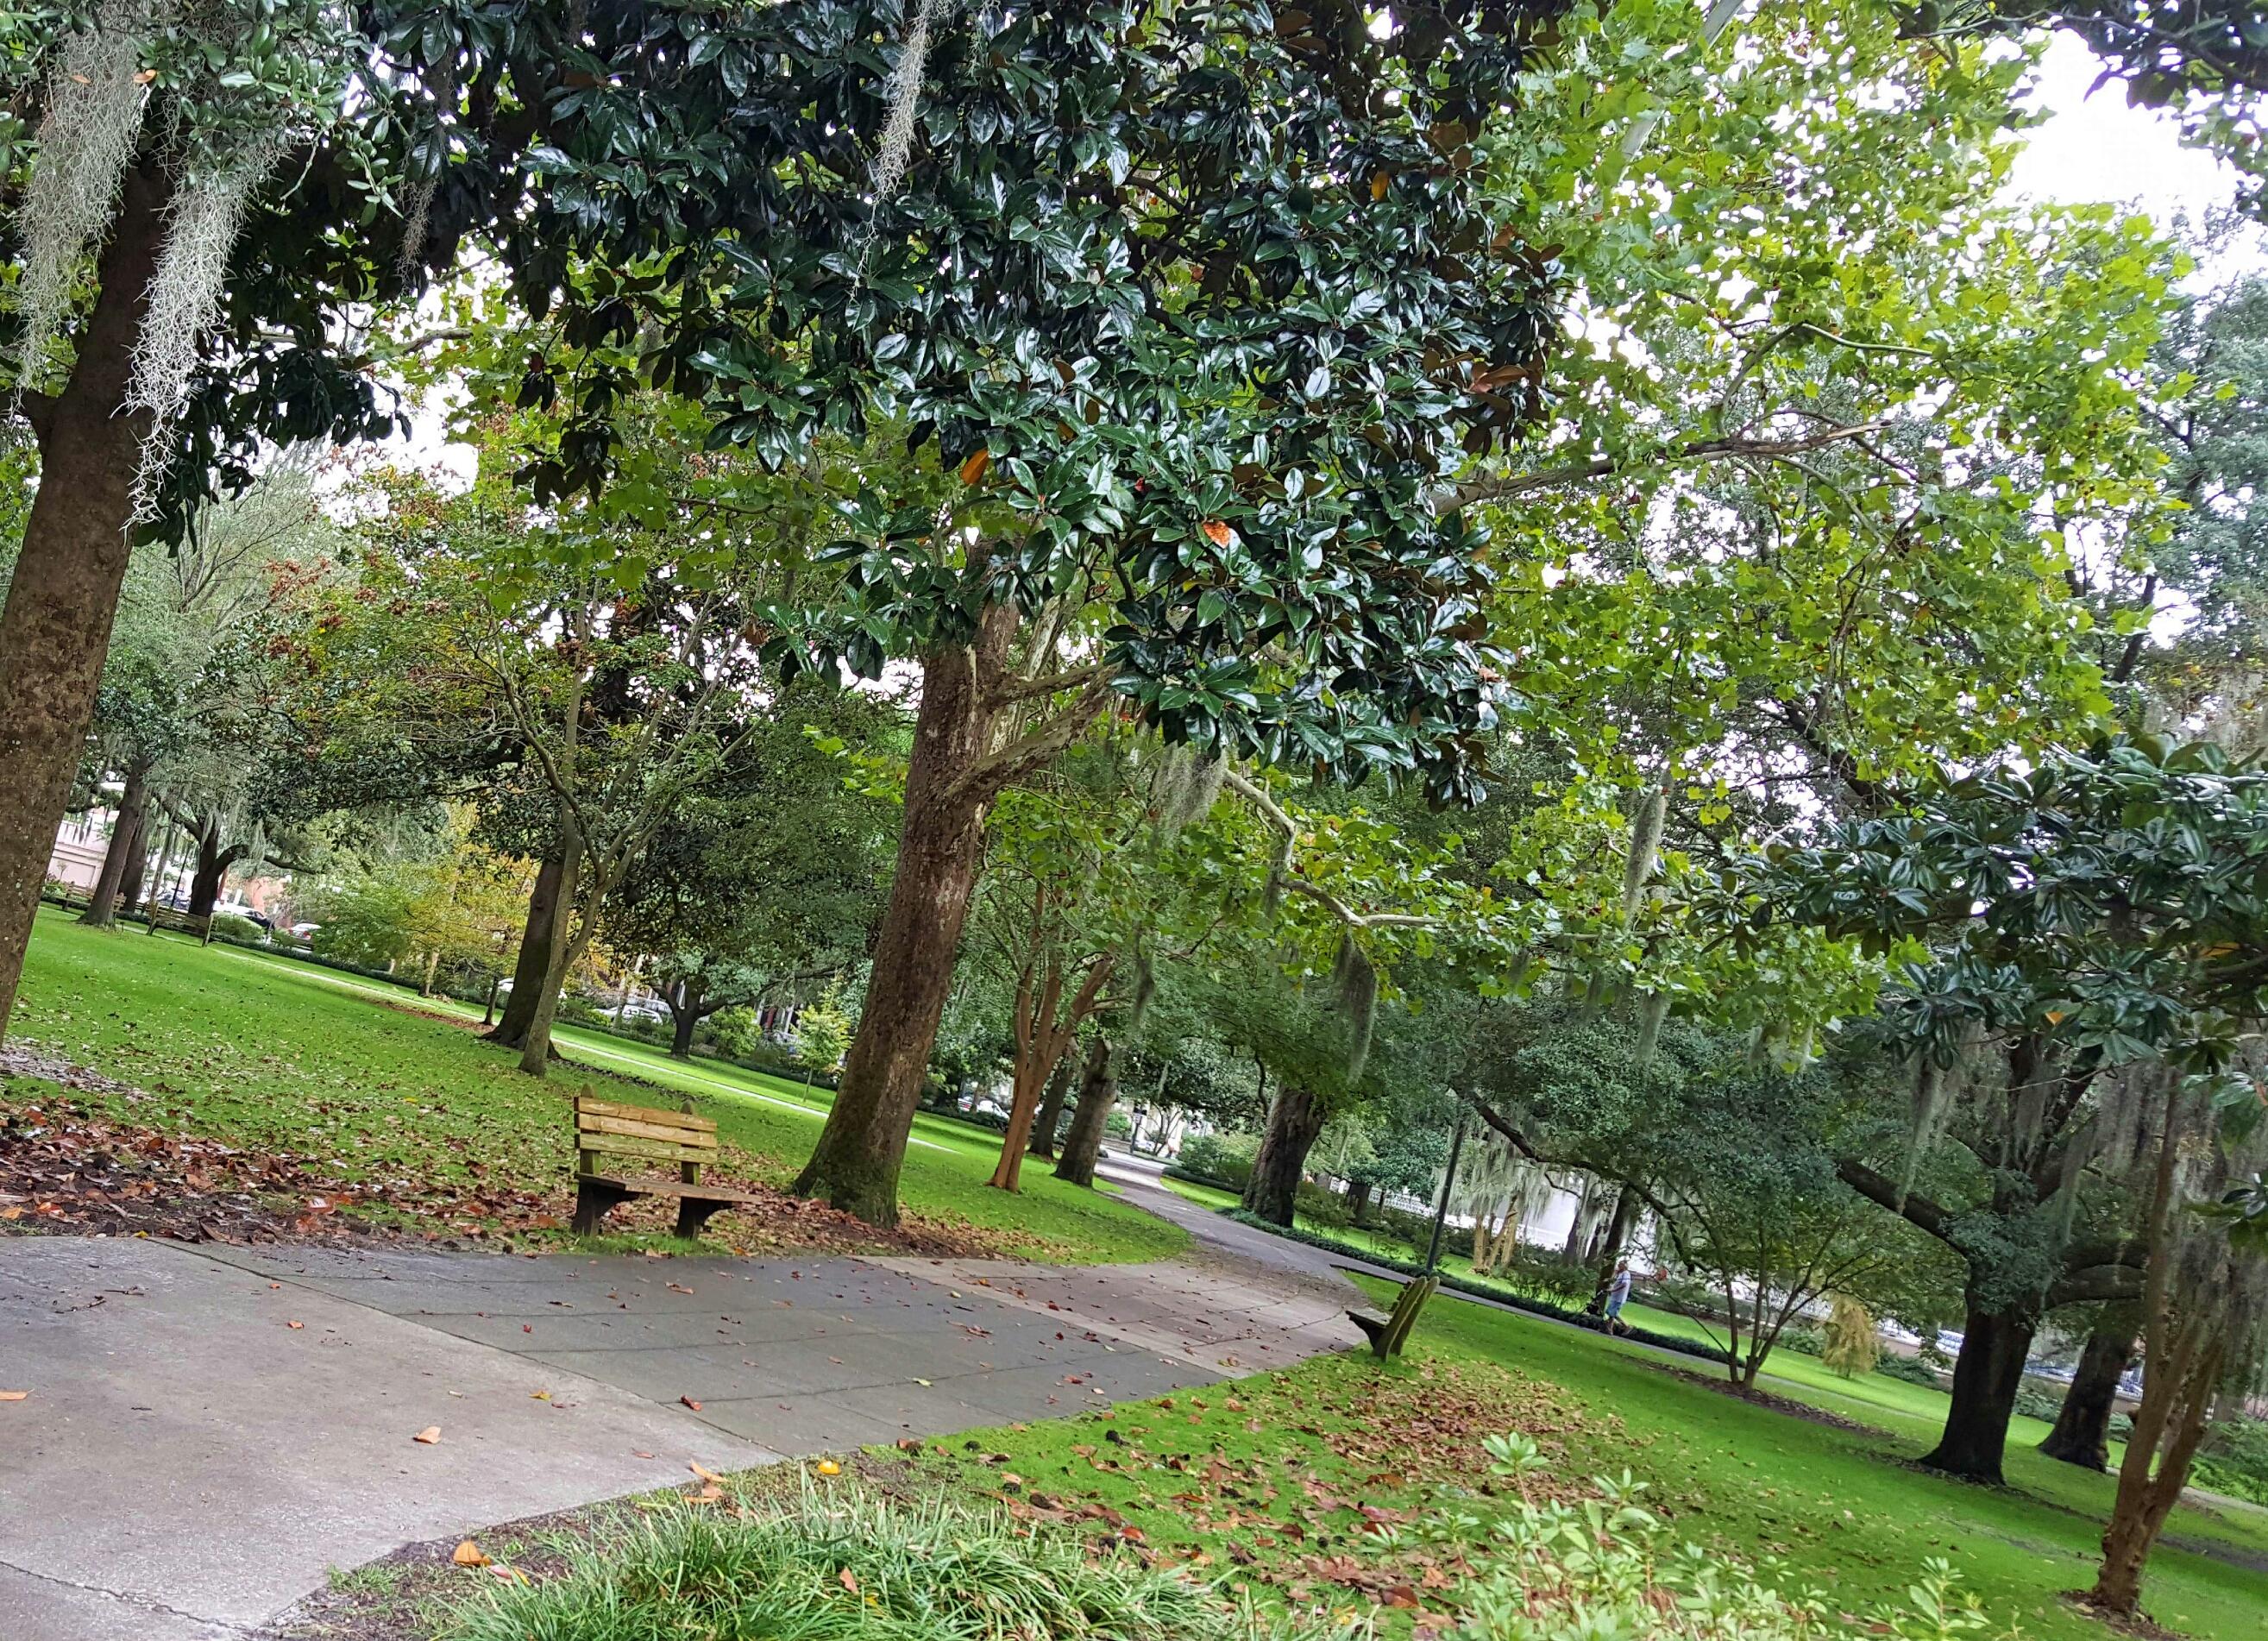 8 Most Romantic Cities in the US. Savannah, GA